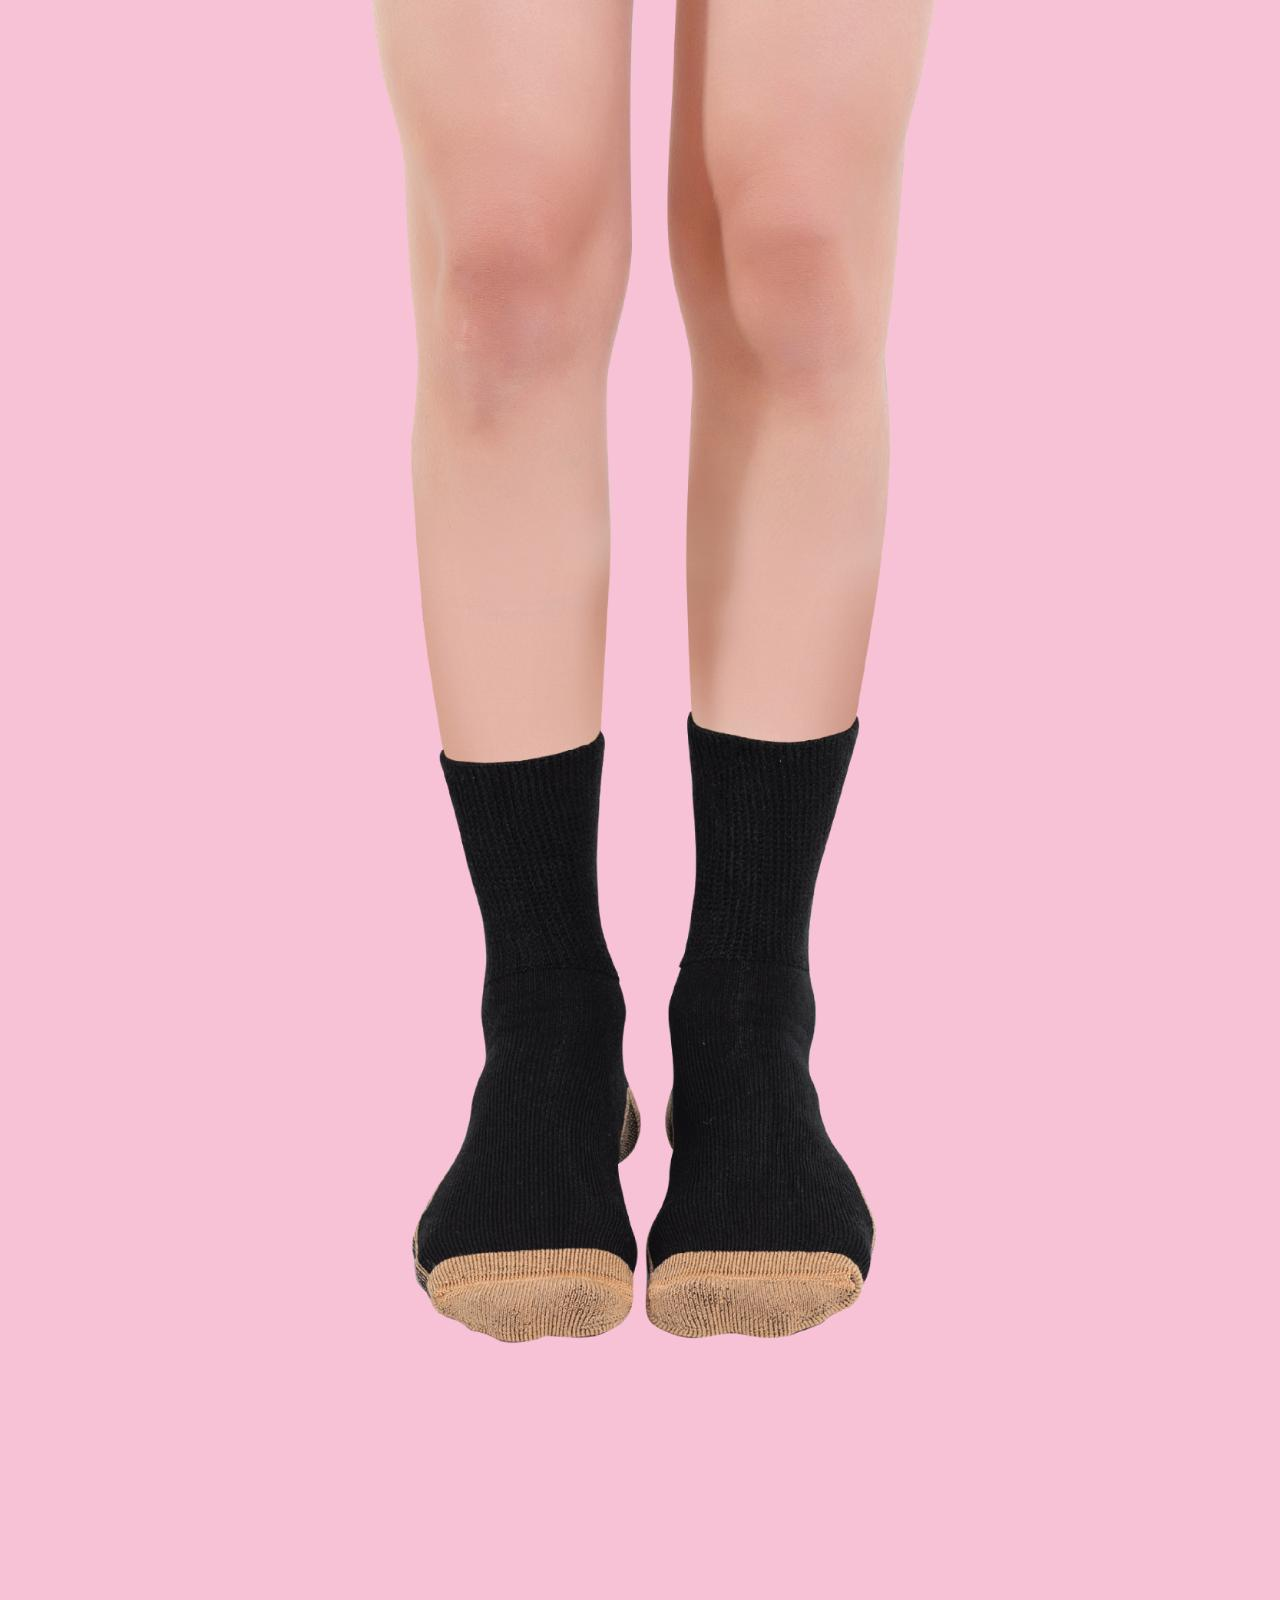 diabalm diabetic foot care cream 3x diabetic